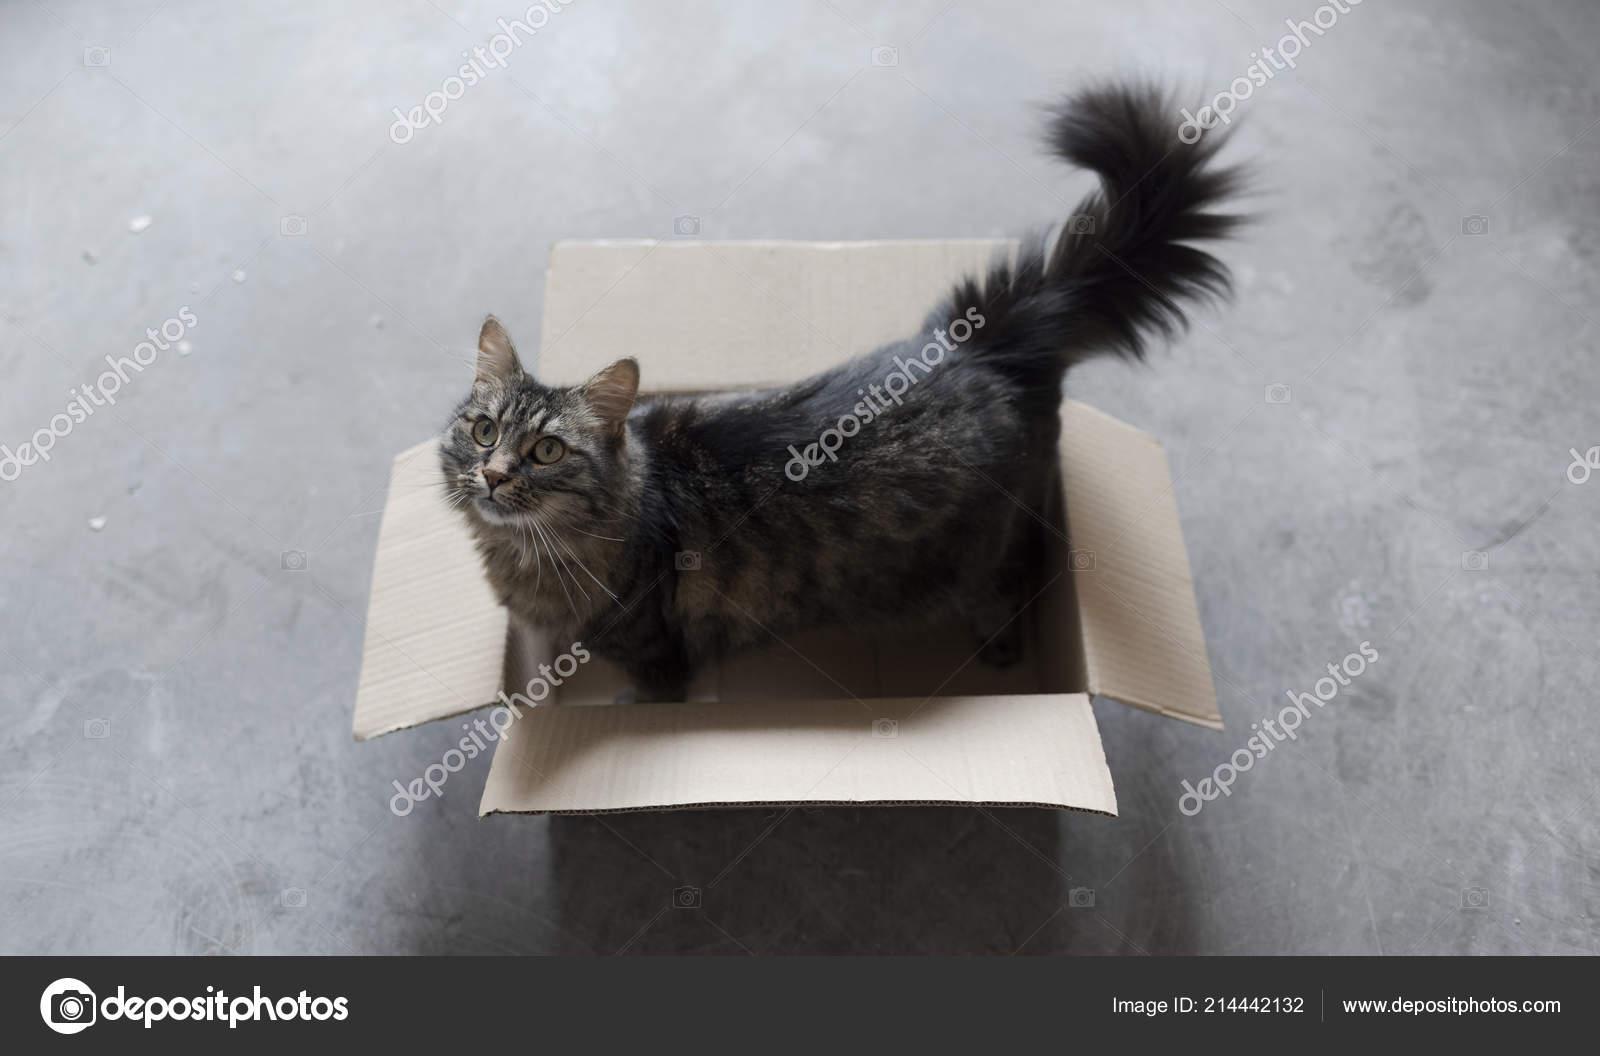 roztomilá kočička otevřena